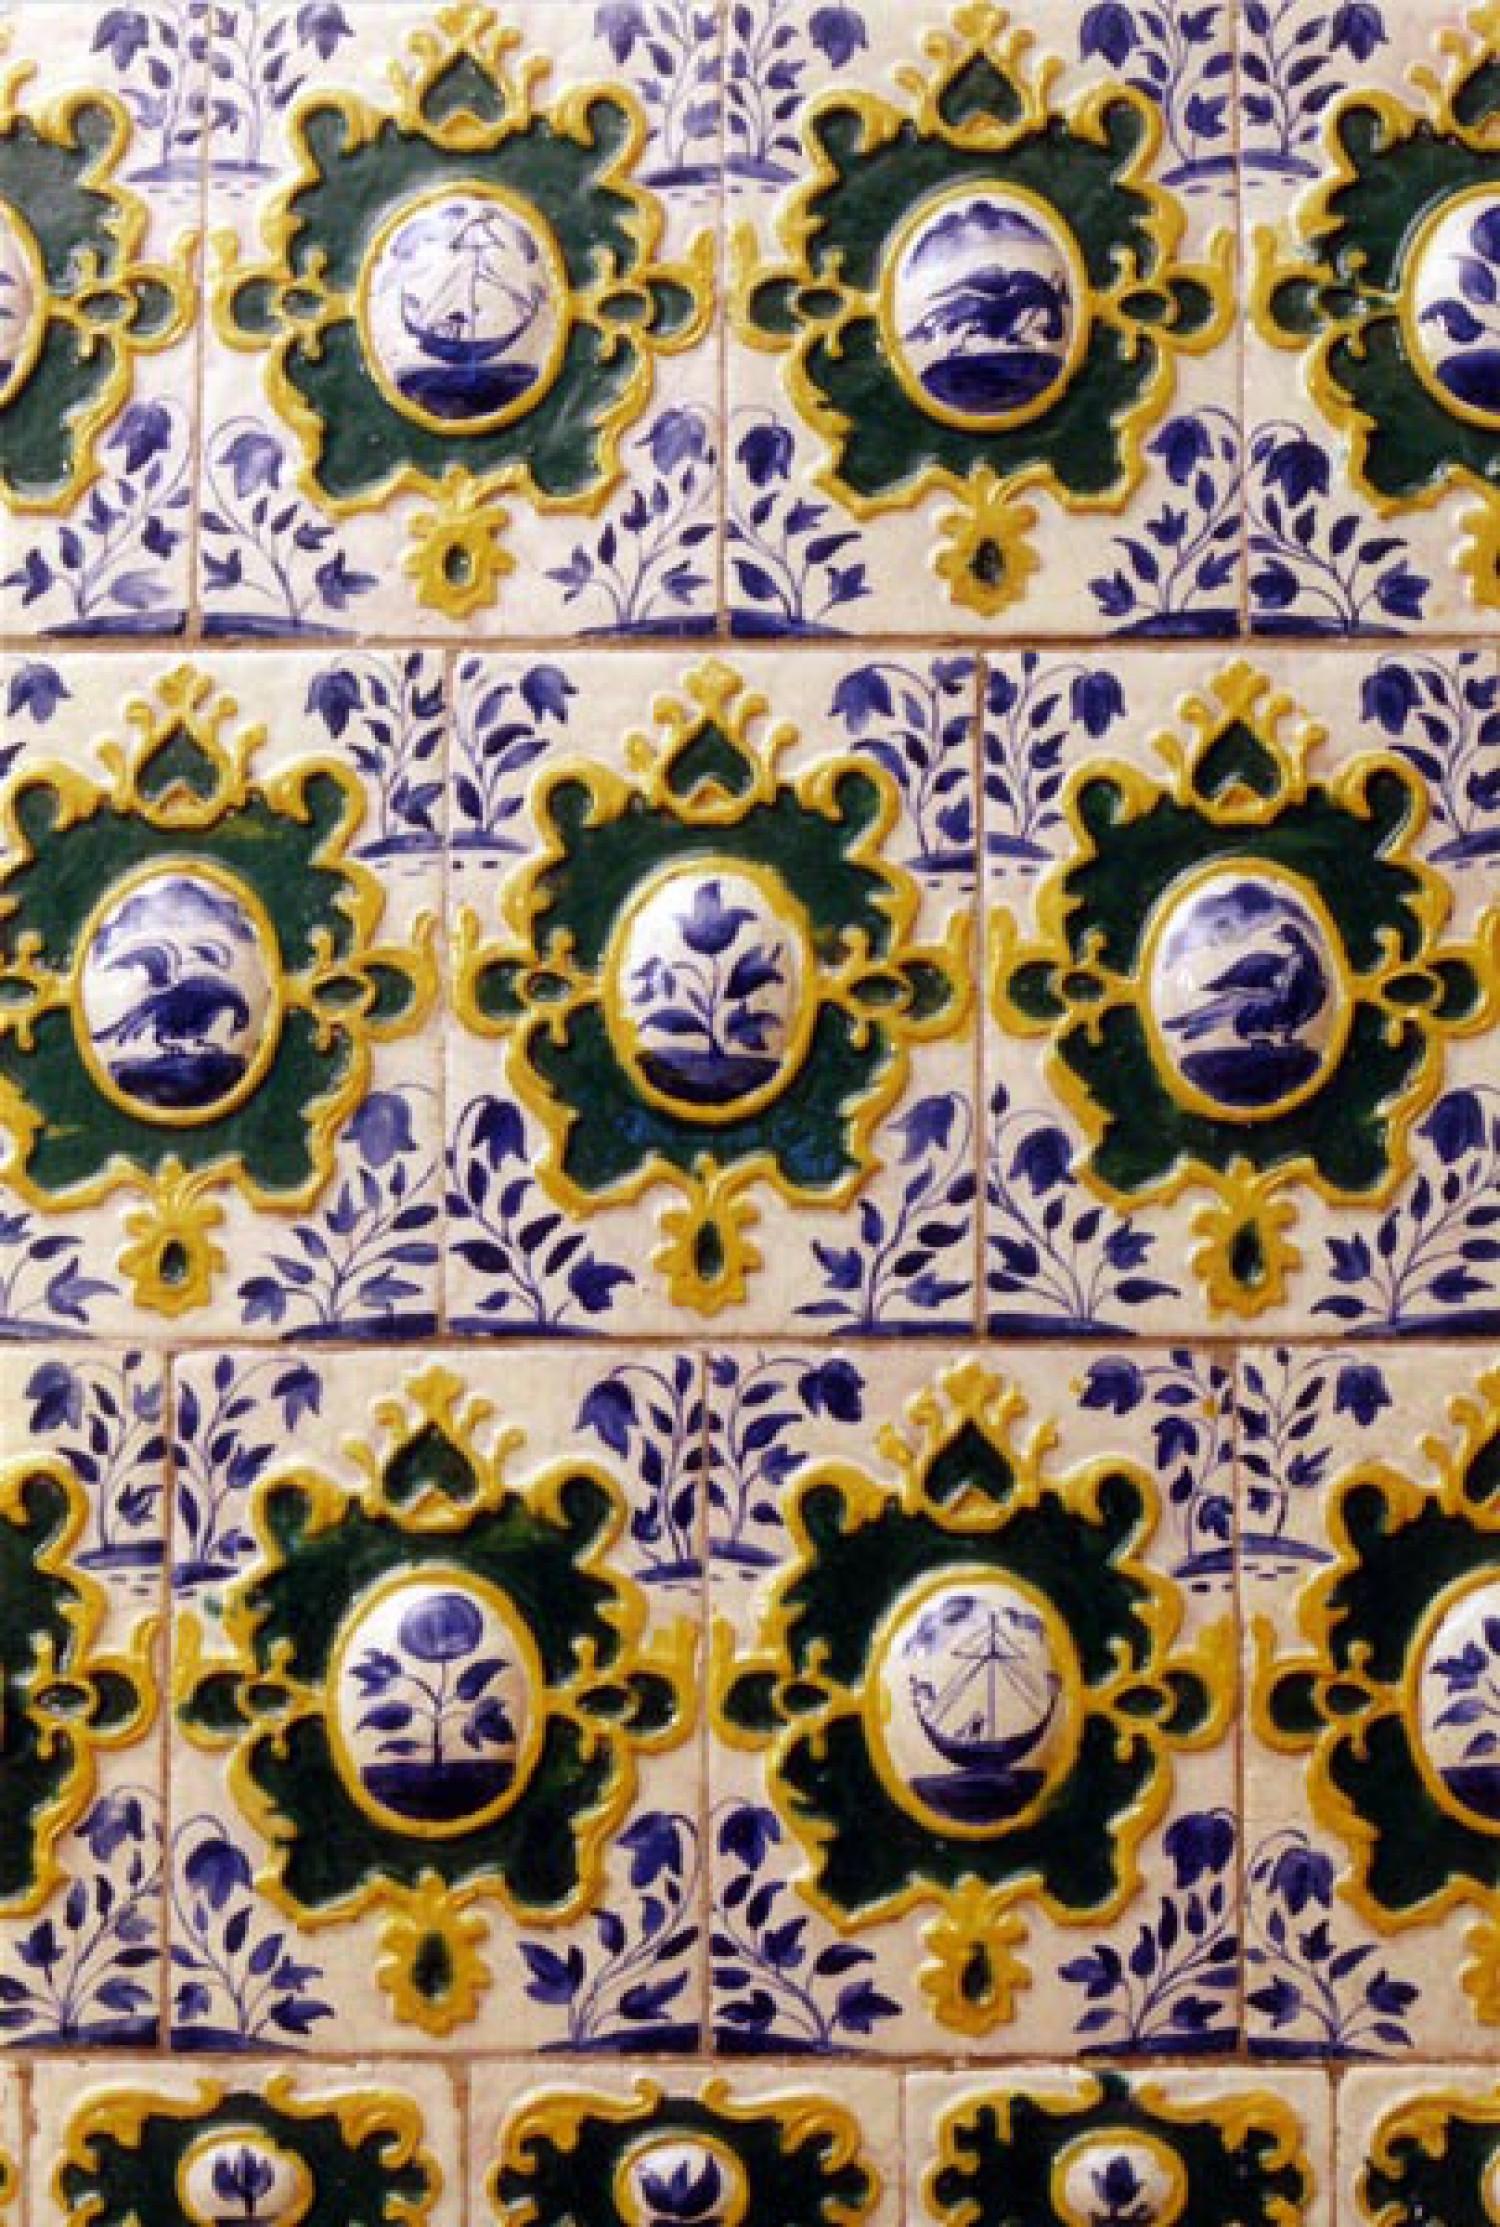 А.Н.Рыбин. Изразцы печи нач. XVIII в. Ярославский музей-заповедник. 1981-1983 гг.